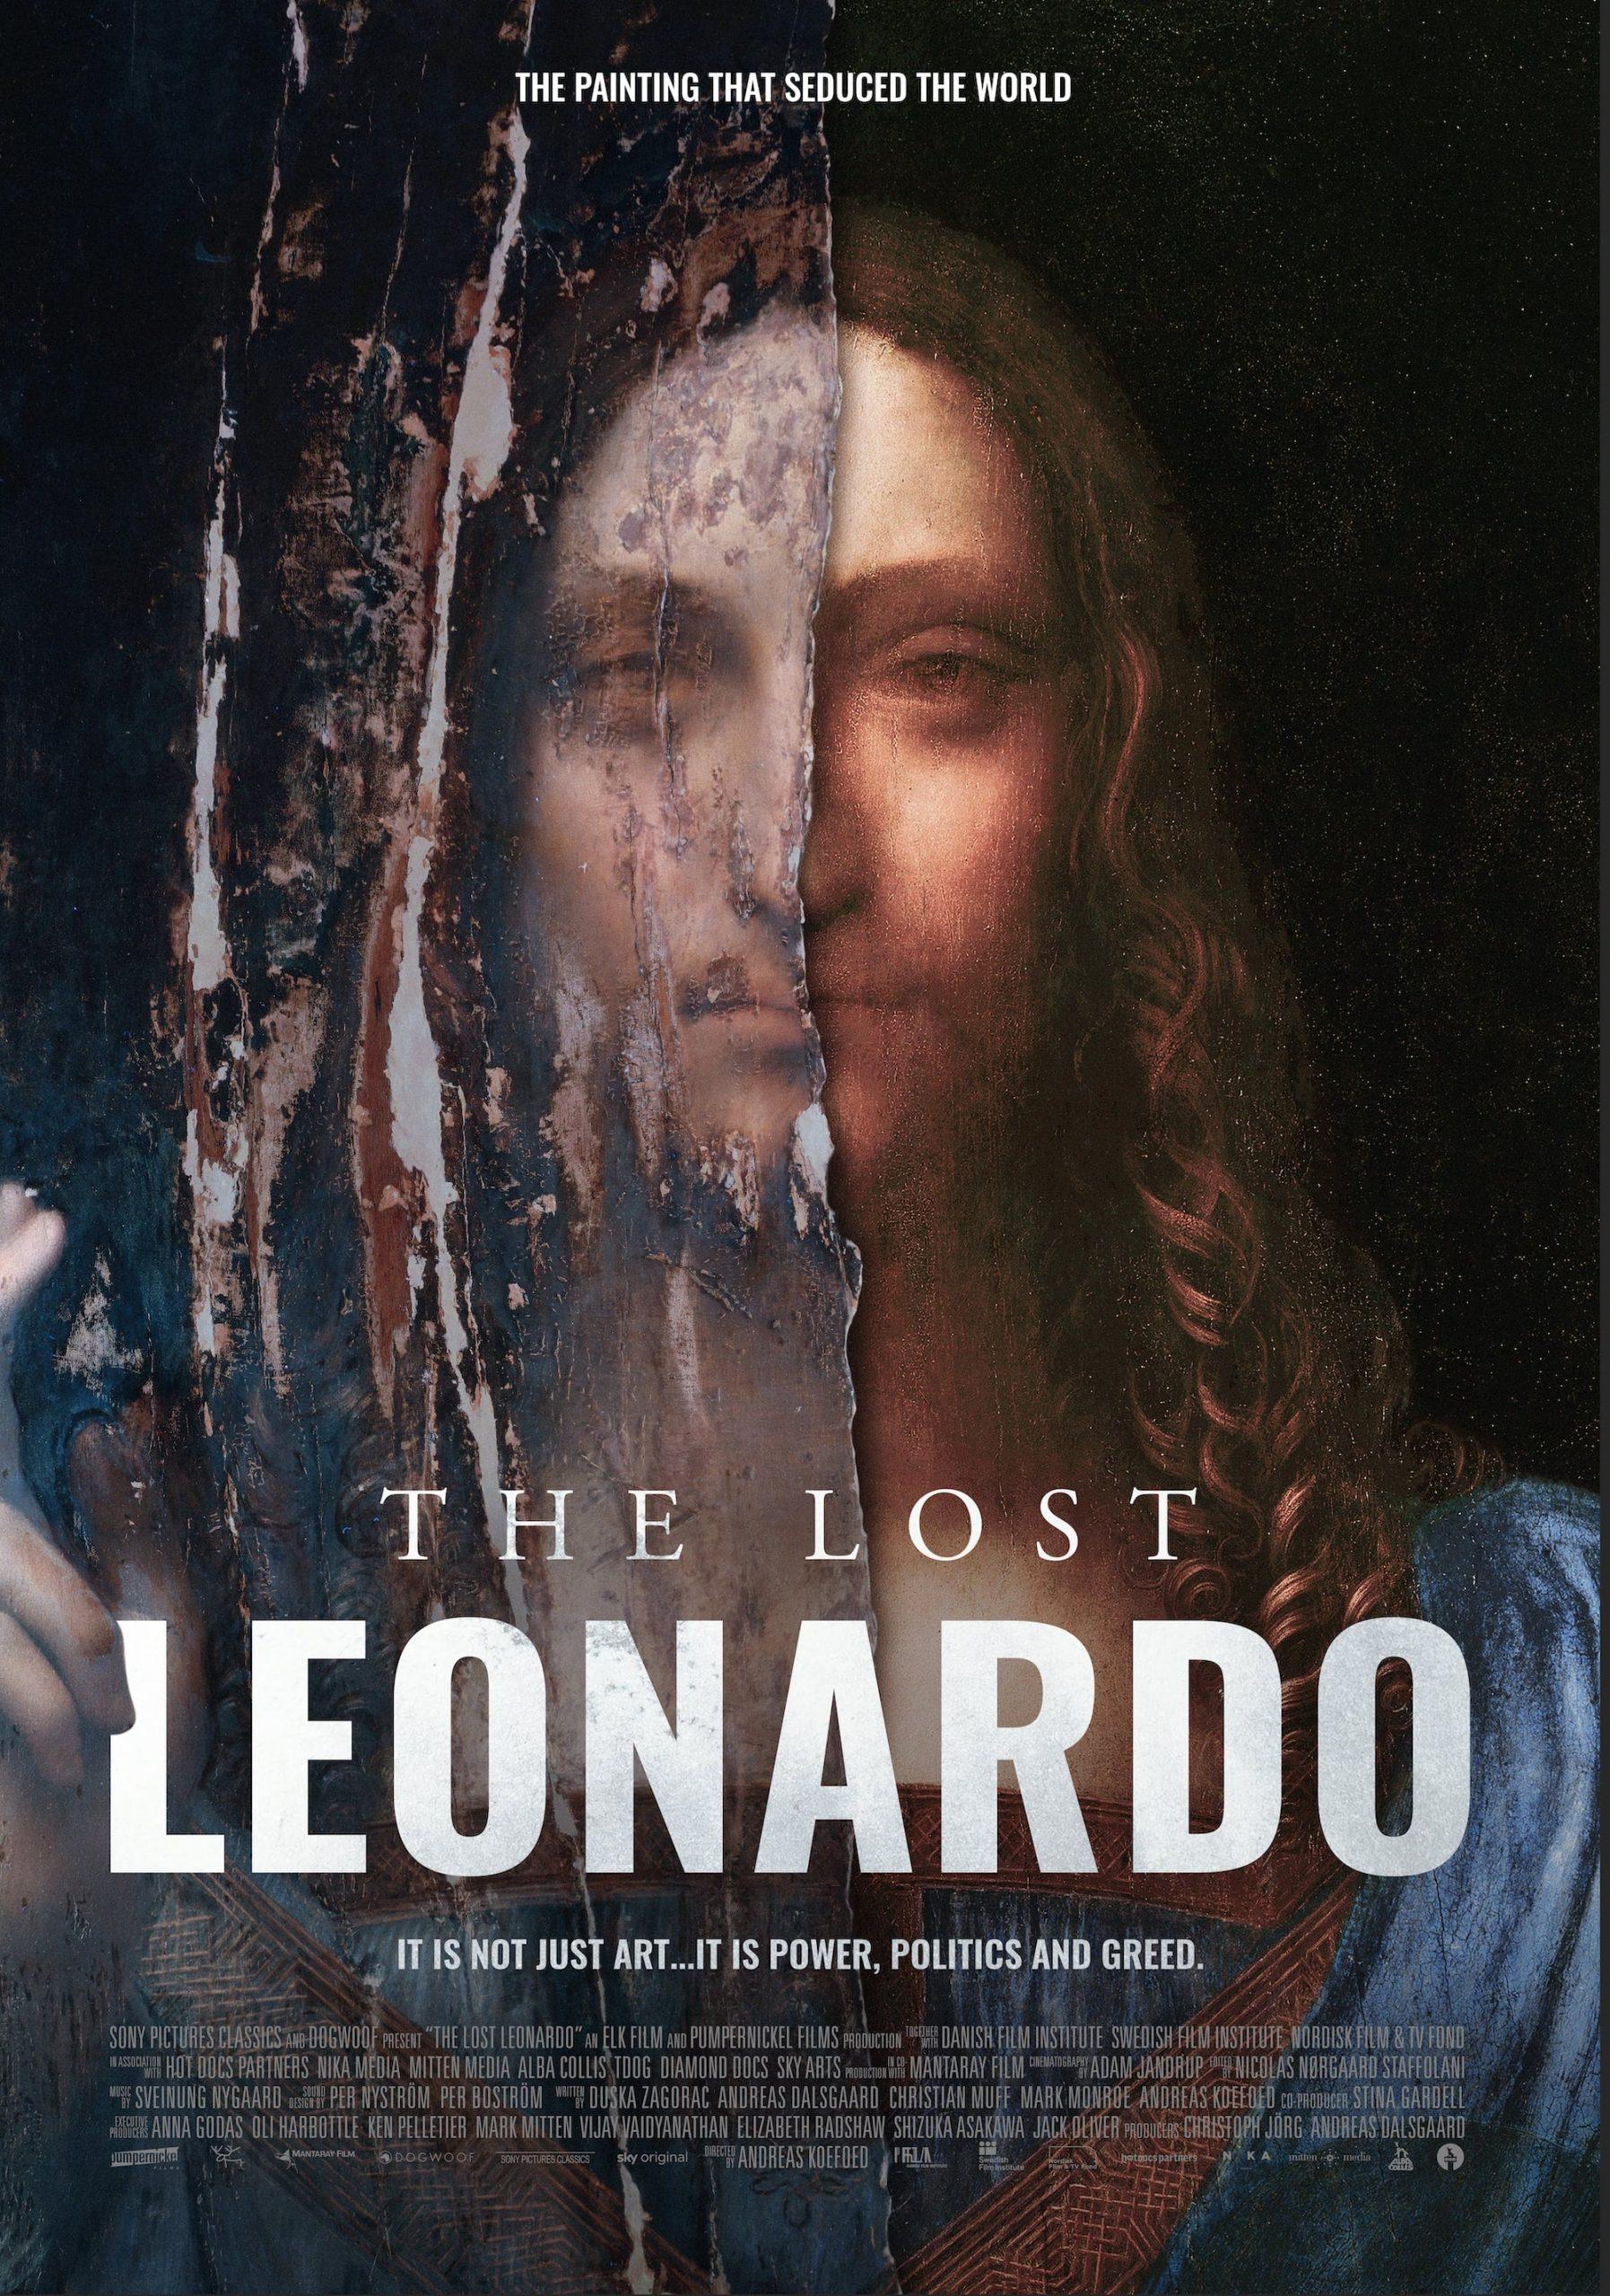 Poster for The Lost Leonardo